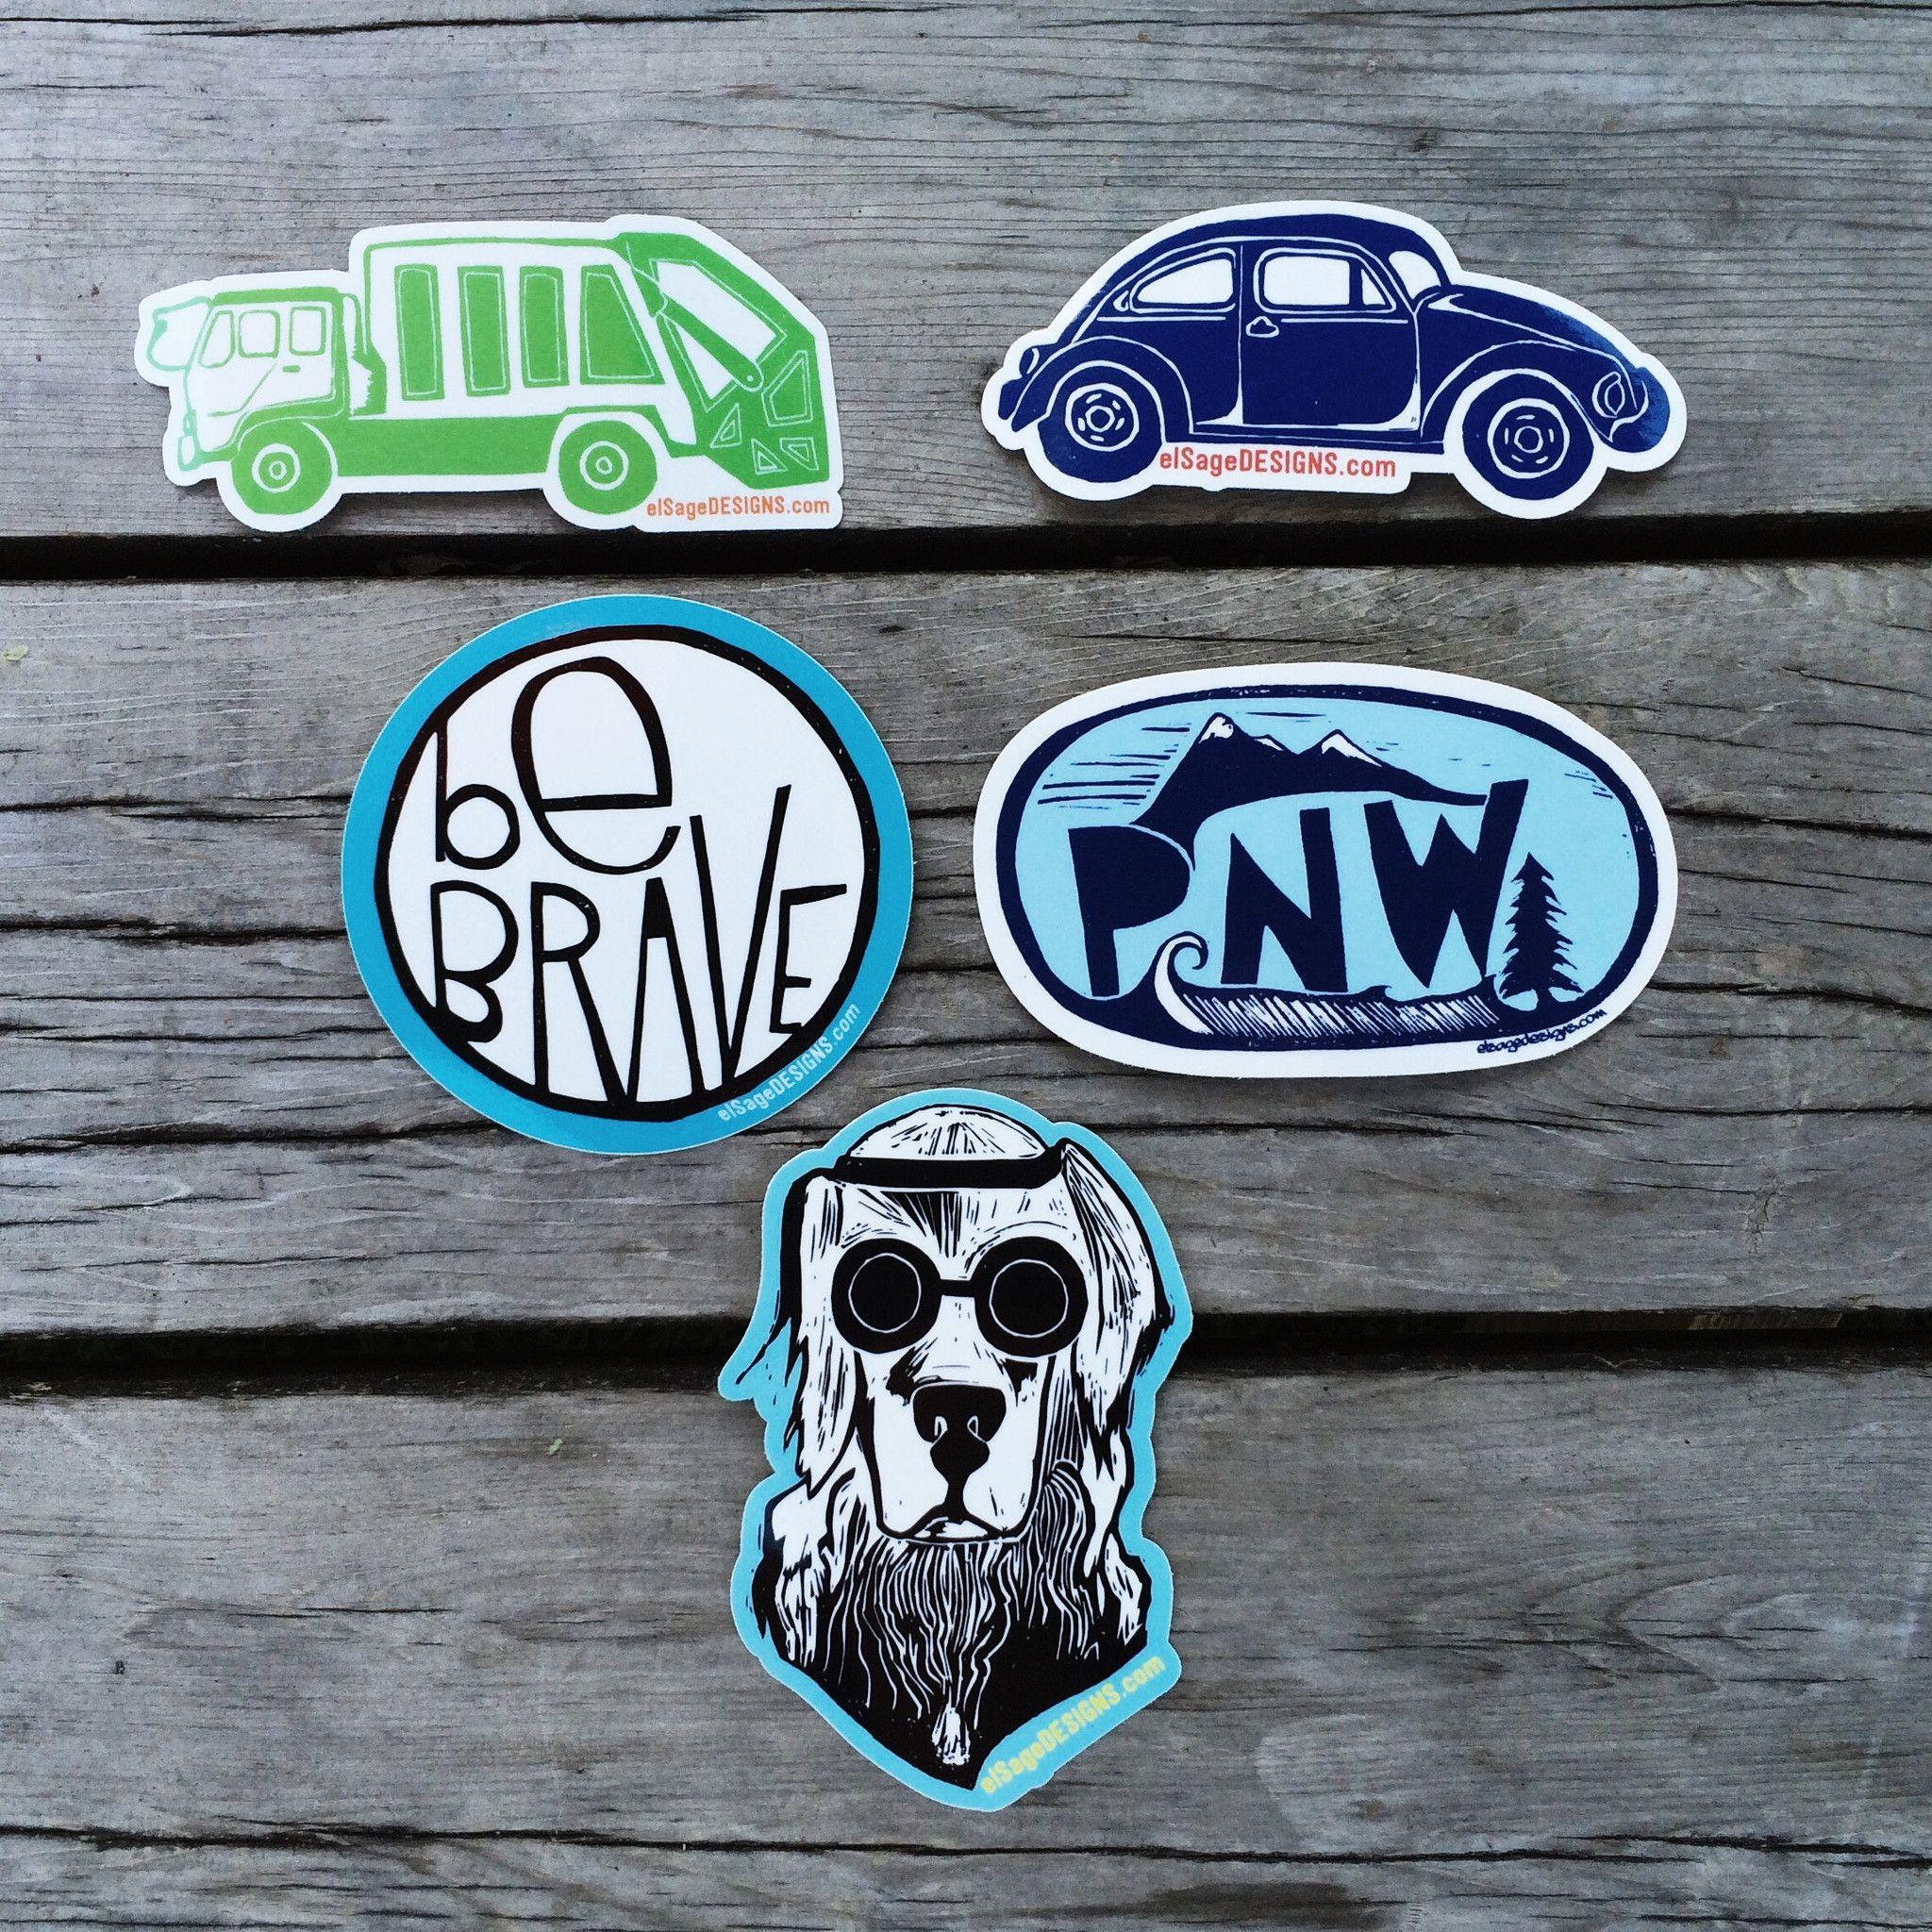 Peace Love Dog Sticker Rad Stickers Dog Stickers Sticker Patches [ 2048 x 2048 Pixel ]